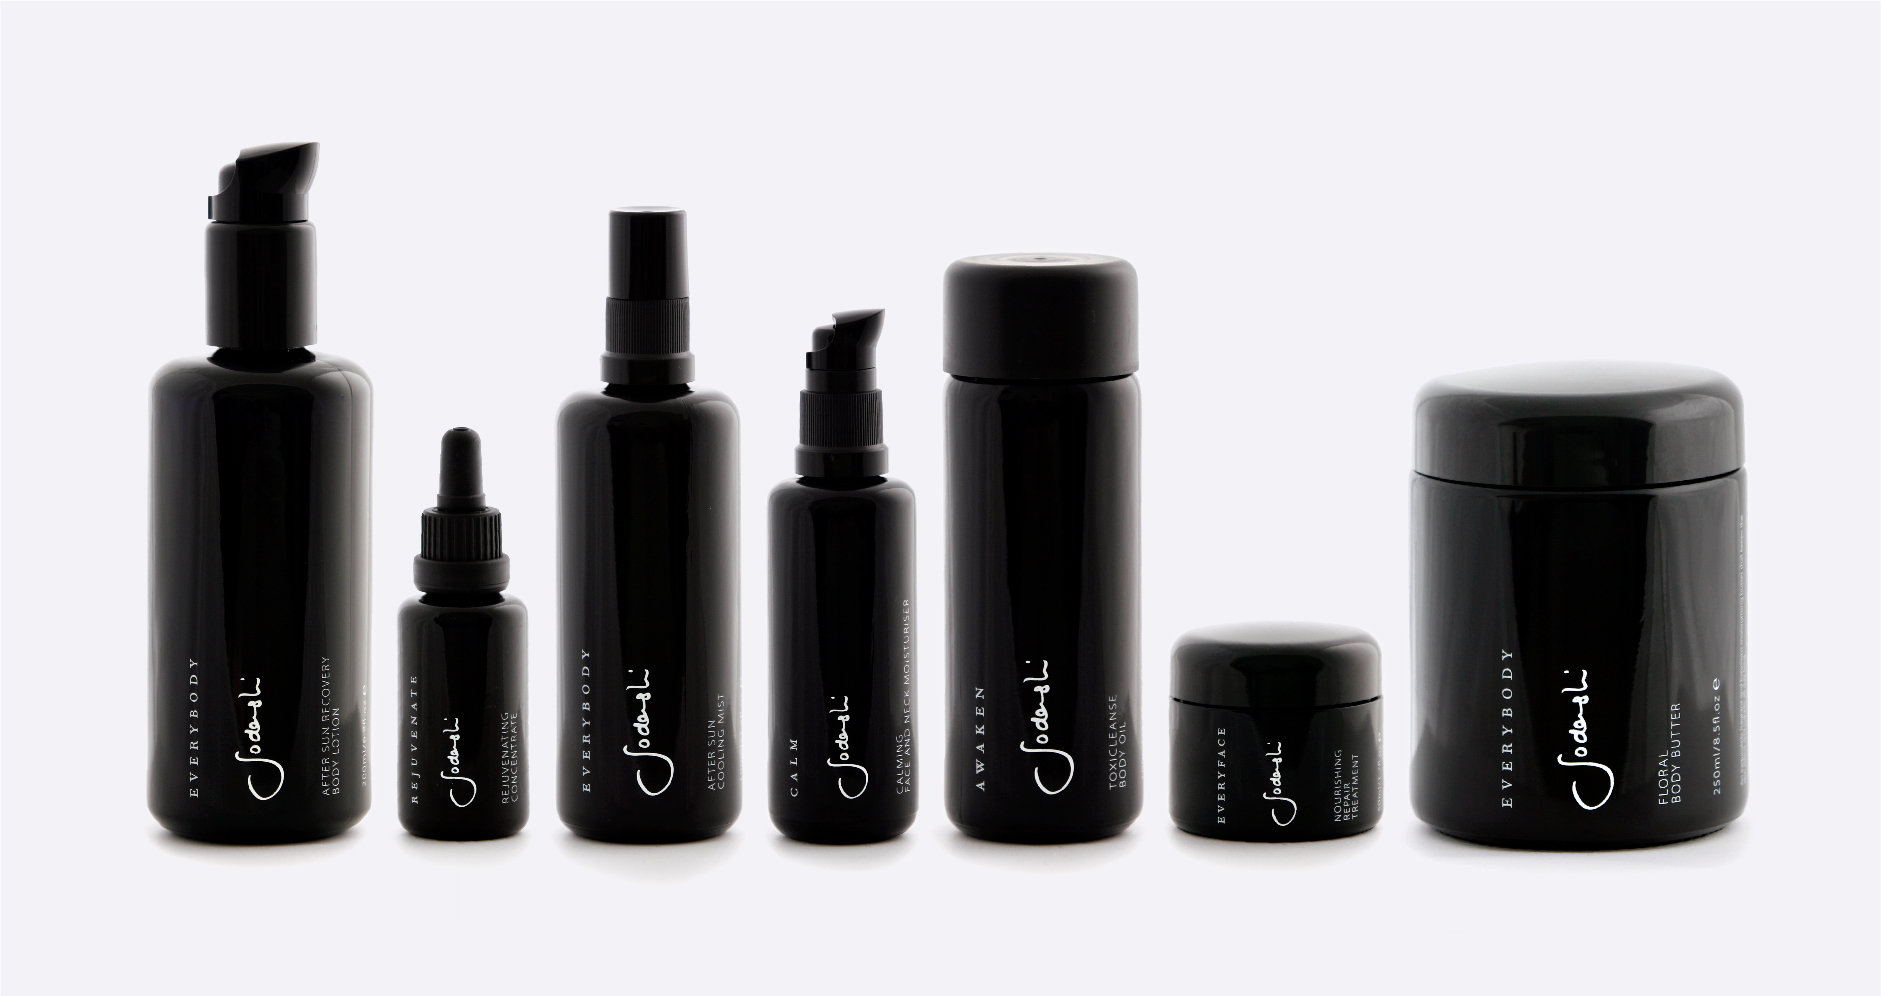 Sodashi skincare light sensitive glass packaging